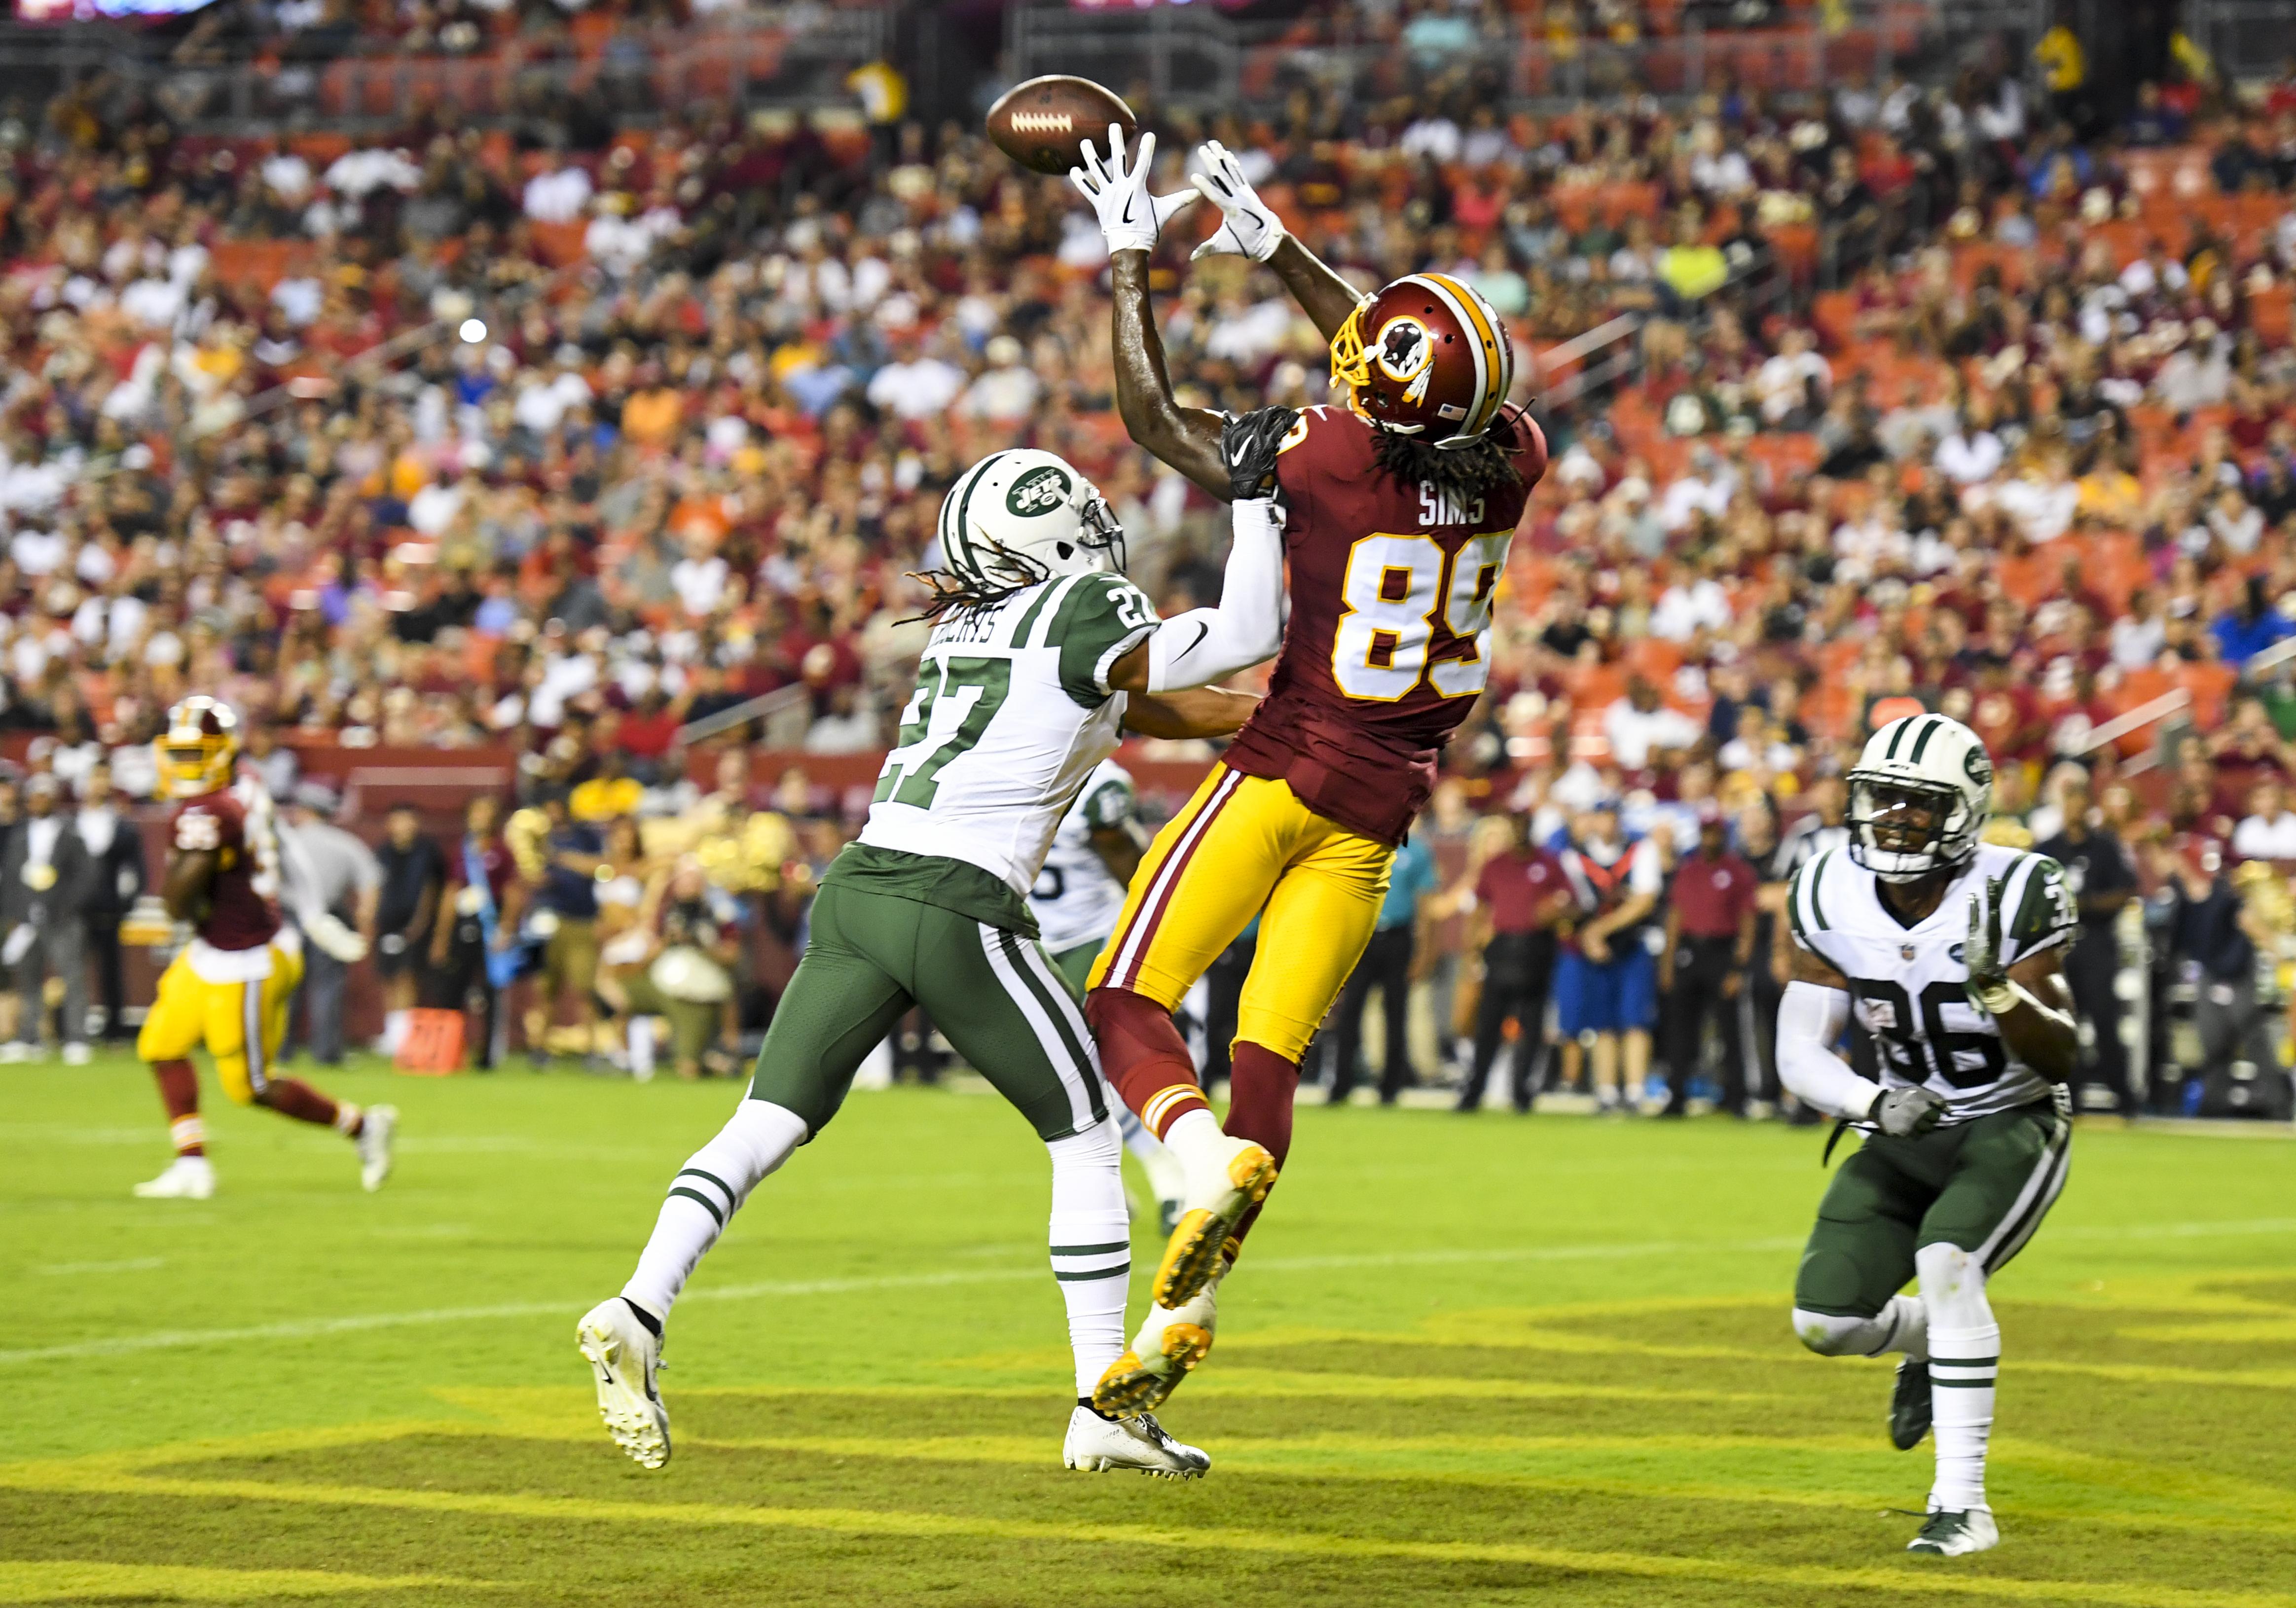 Preseason football. New York Jets at Washington Redskins